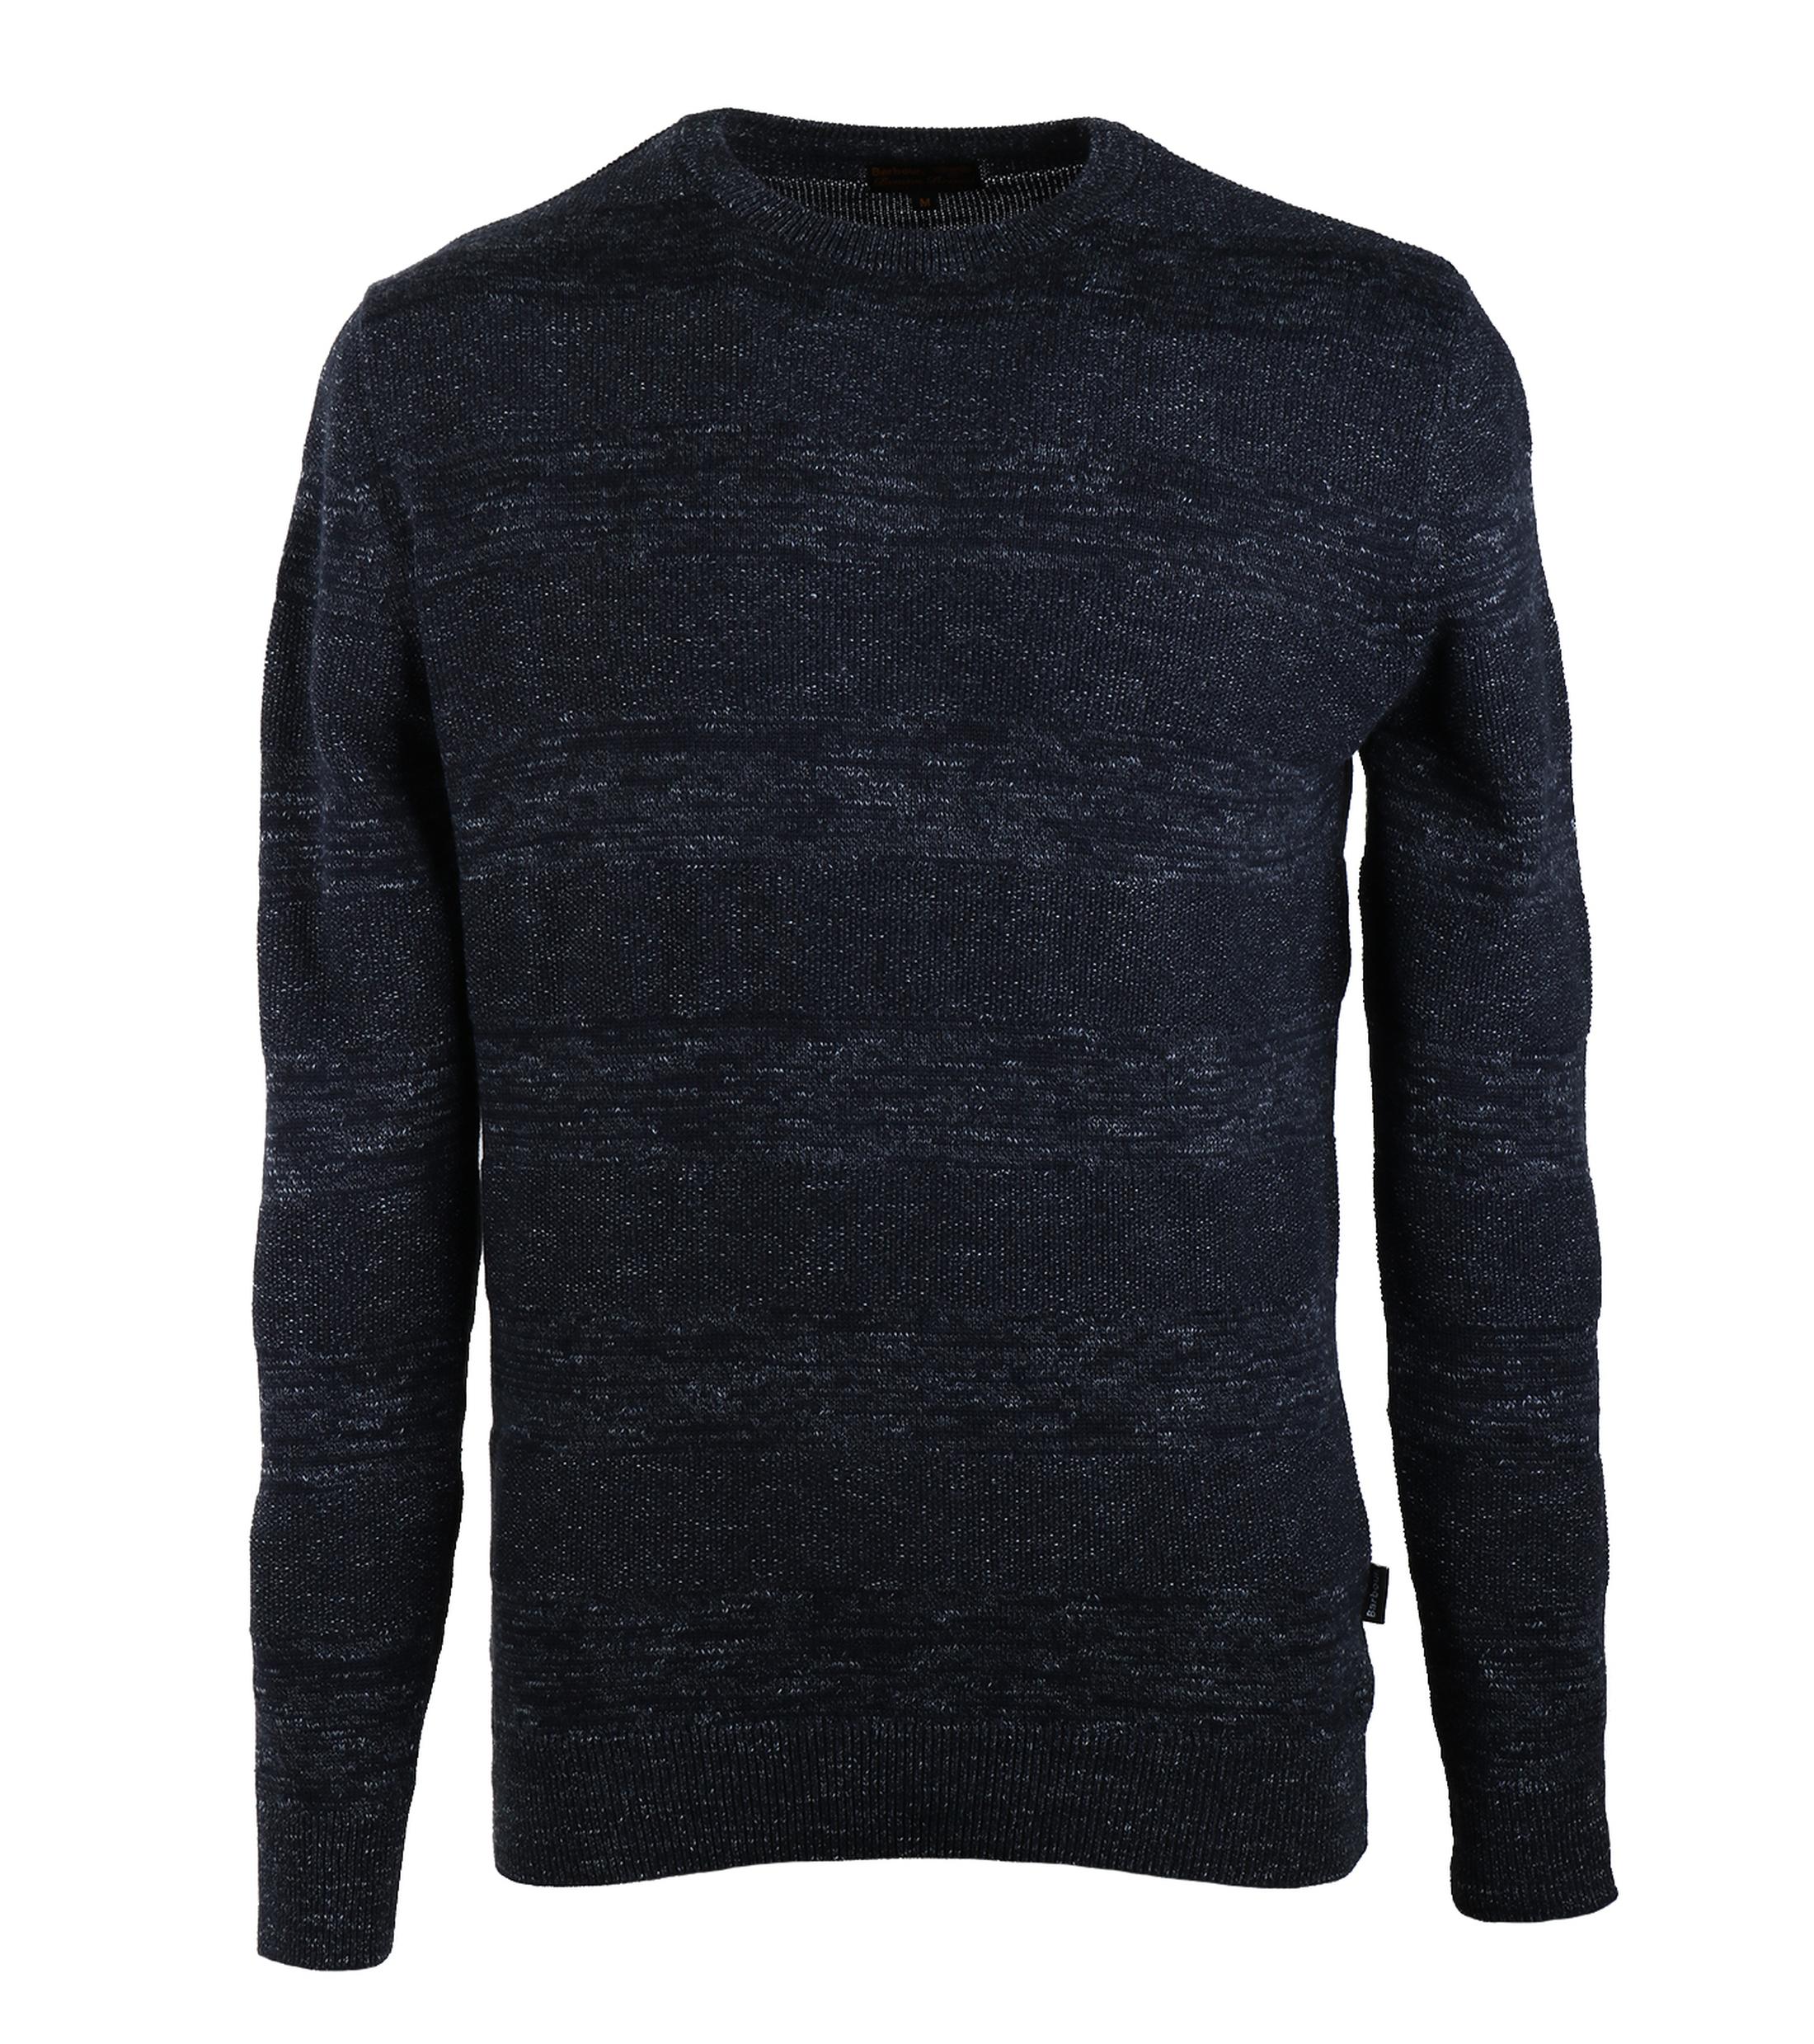 barbour vernon pullover online kaufen suitable. Black Bedroom Furniture Sets. Home Design Ideas